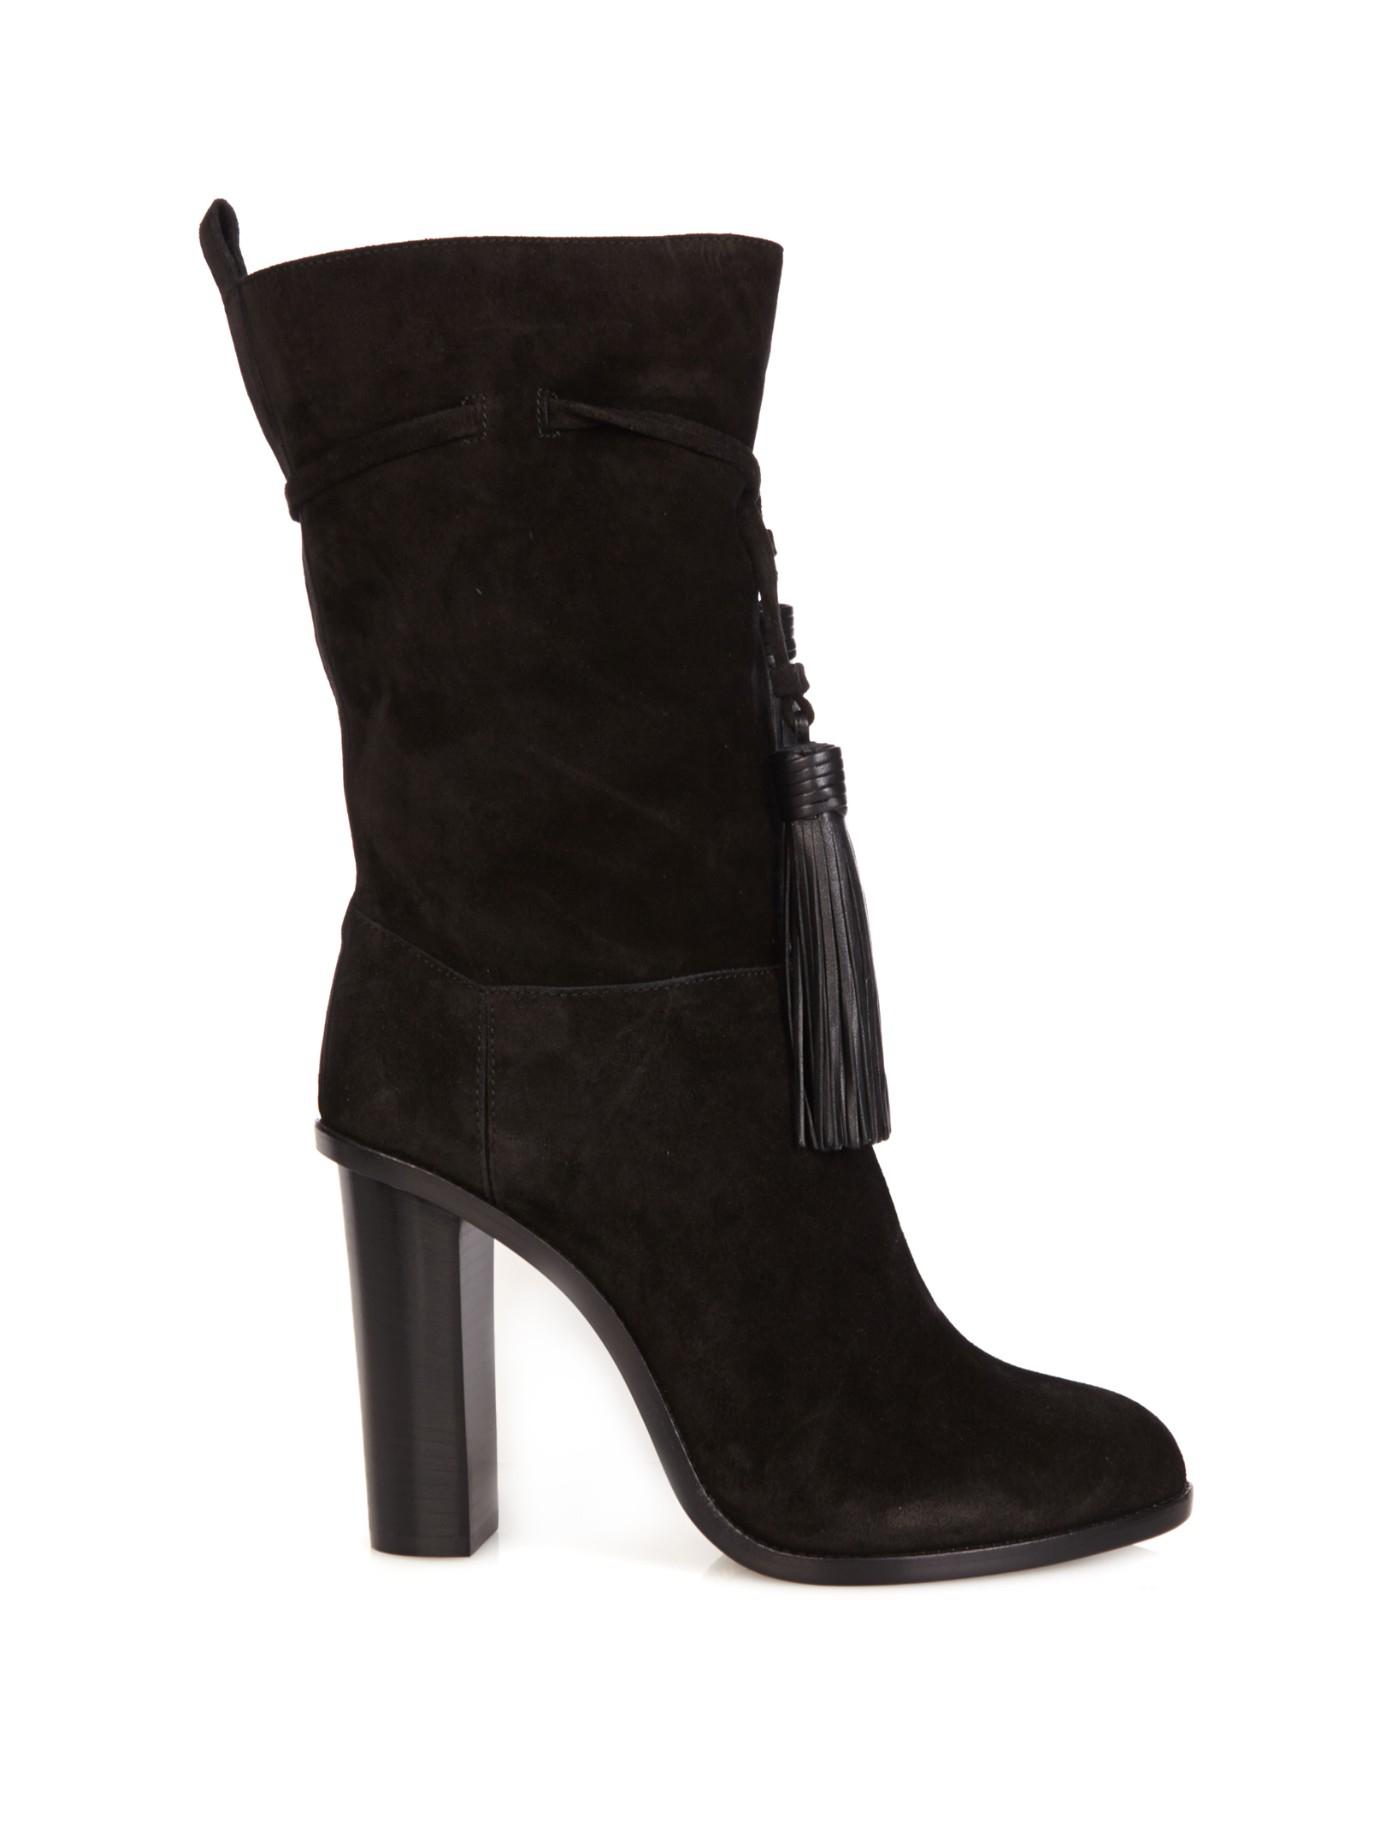 lanvin tassel tie slouchy suede boots in black lyst